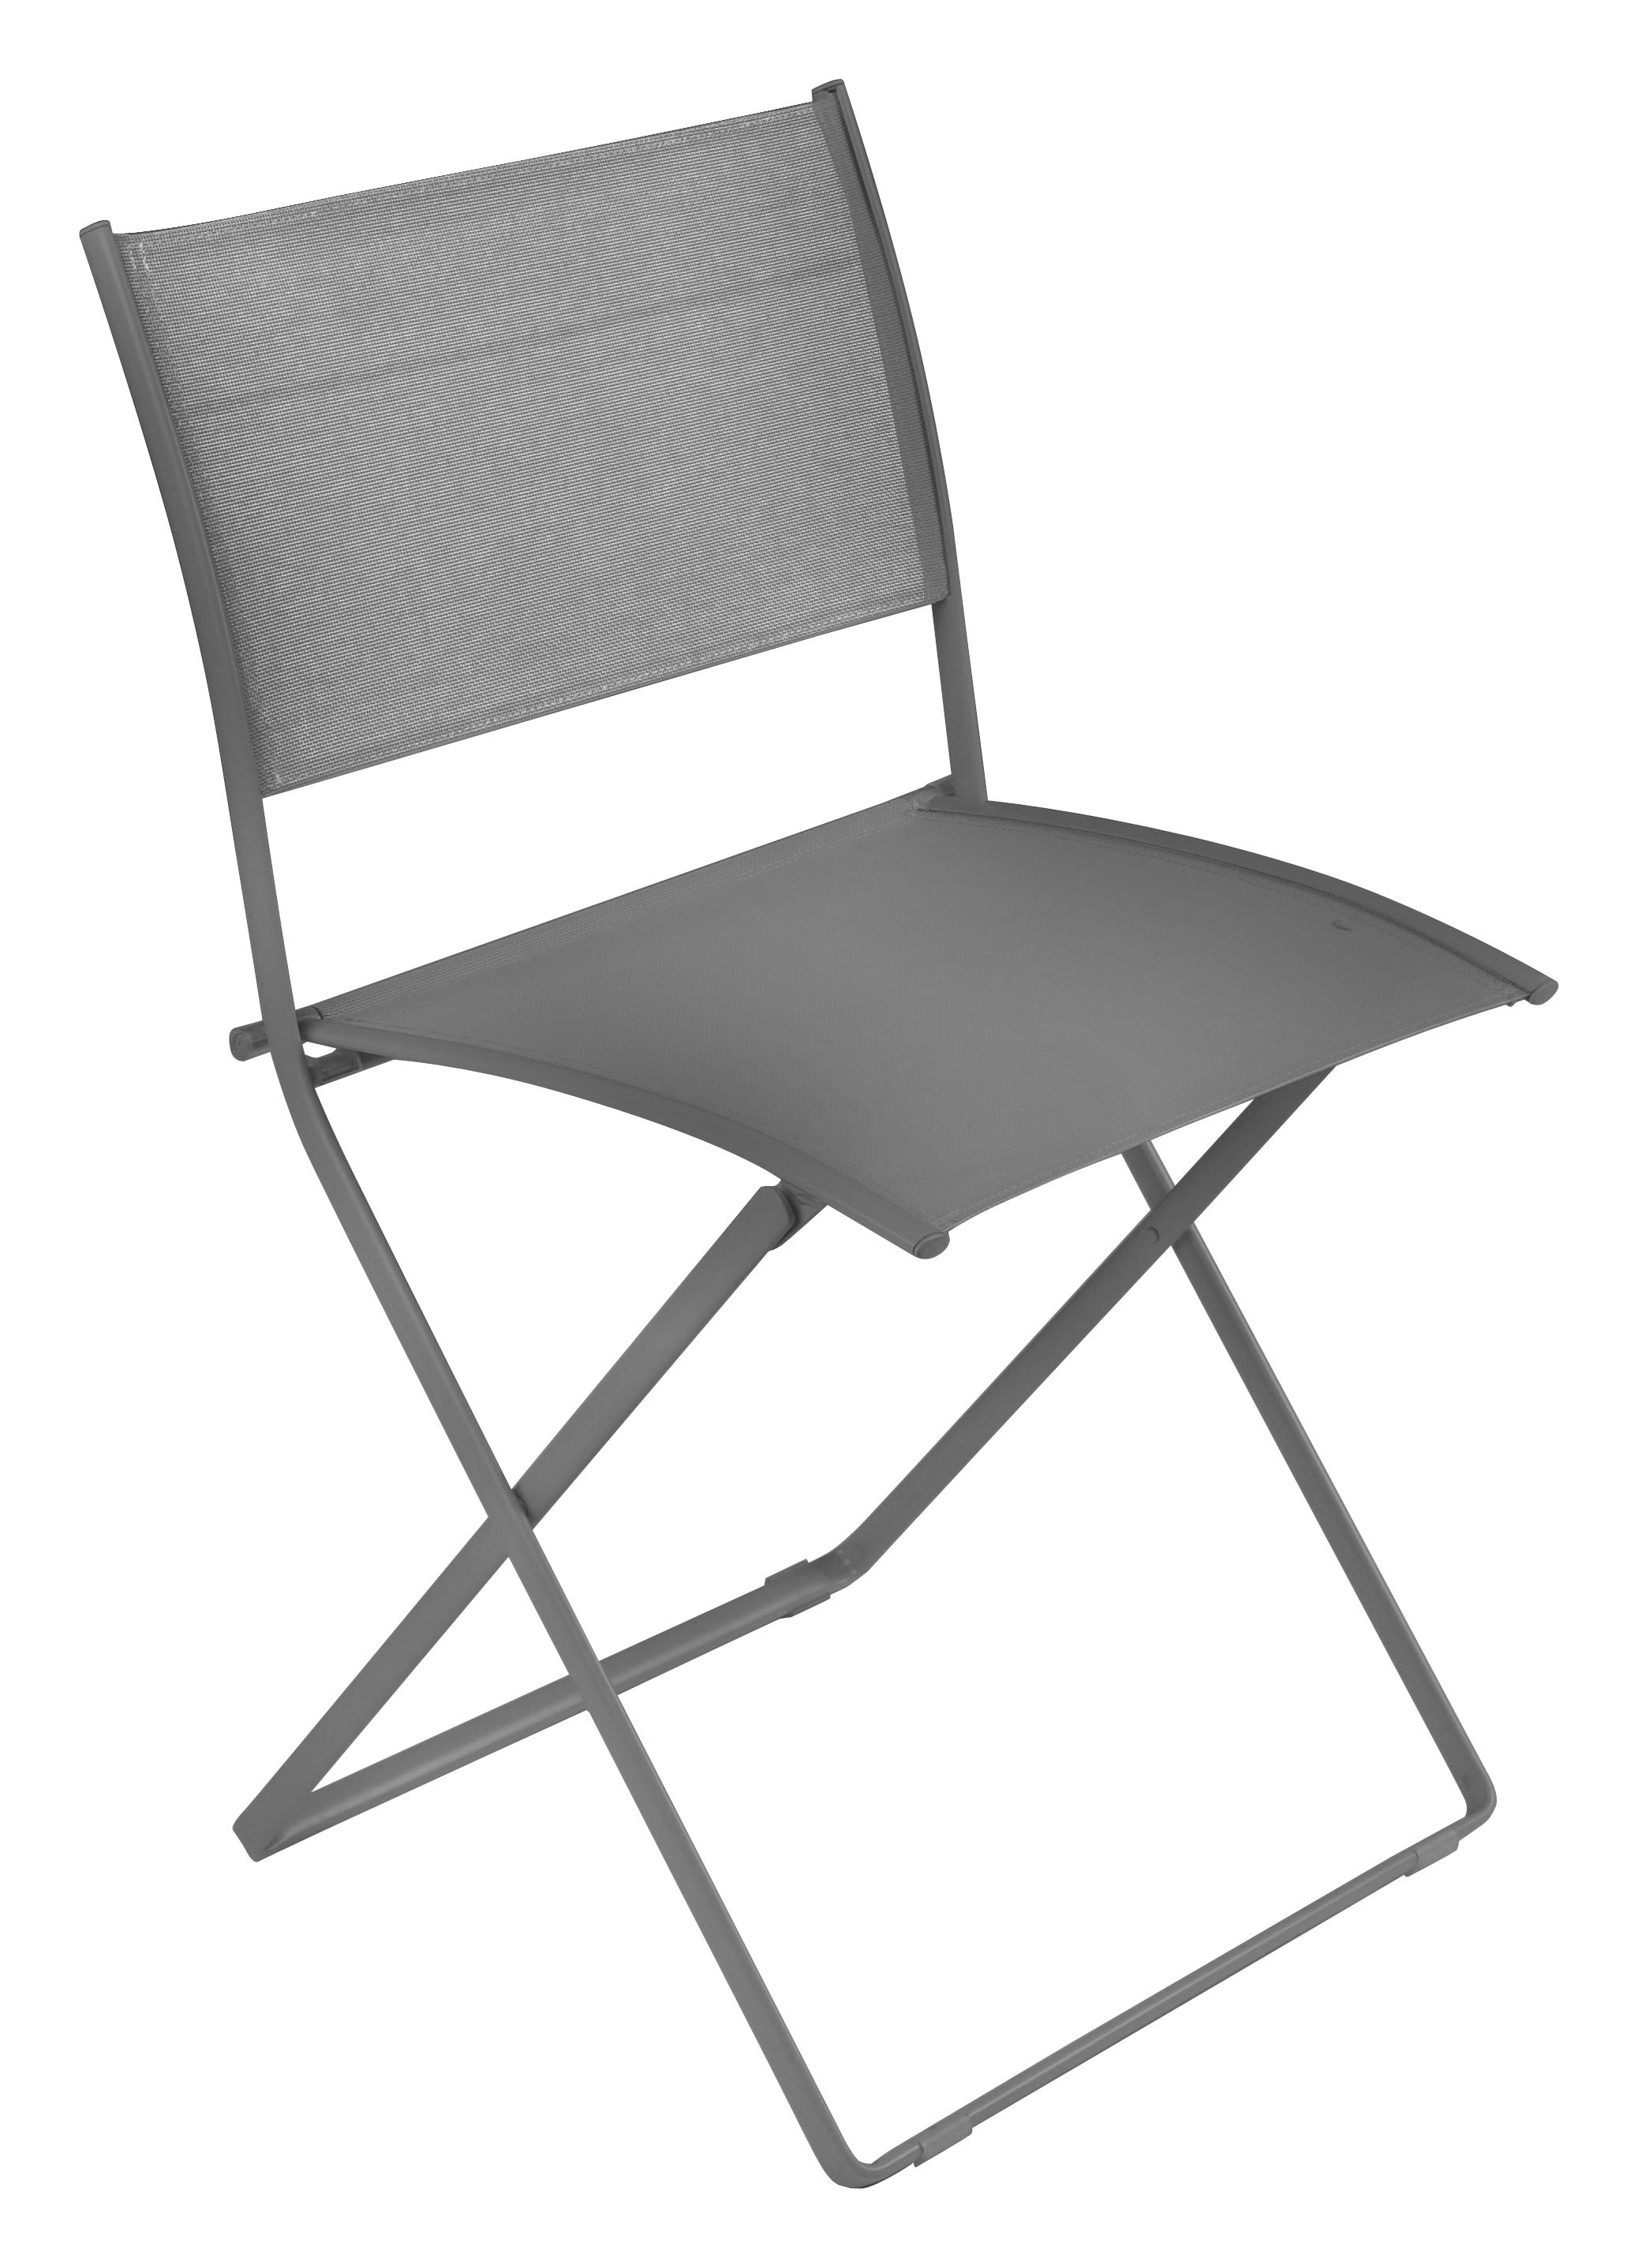 chaise pliante plein air toile gris m tal fermob. Black Bedroom Furniture Sets. Home Design Ideas